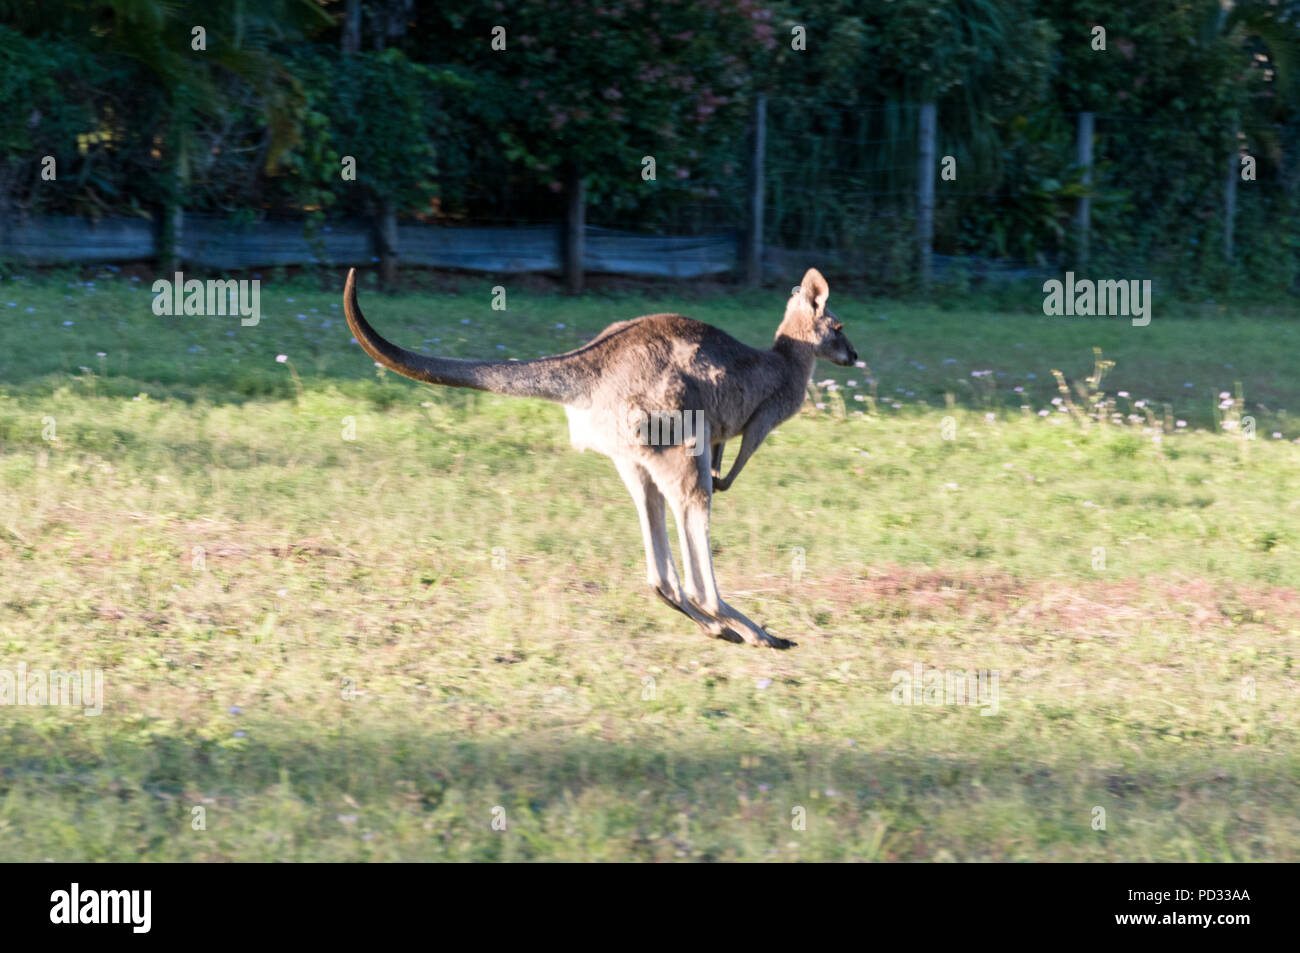 An Eastern Grey Kangaroo  (Macropus giganteus) leaping across open land on the Sunshine Coast in Queensland, Australia - Stock Image